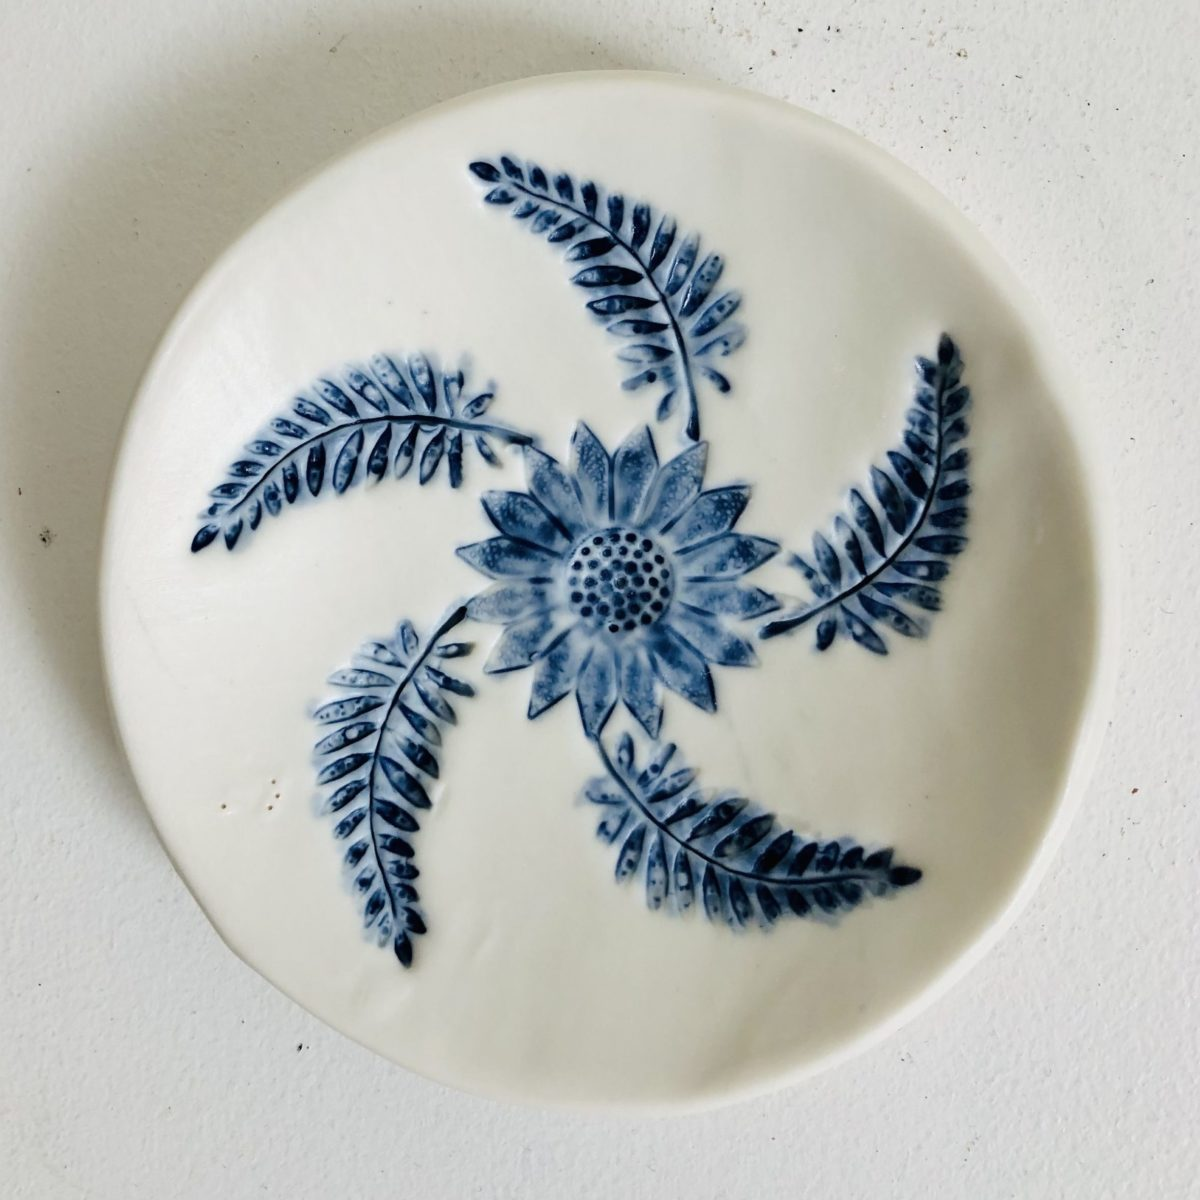 Soap dish made by Philippa de Burlett